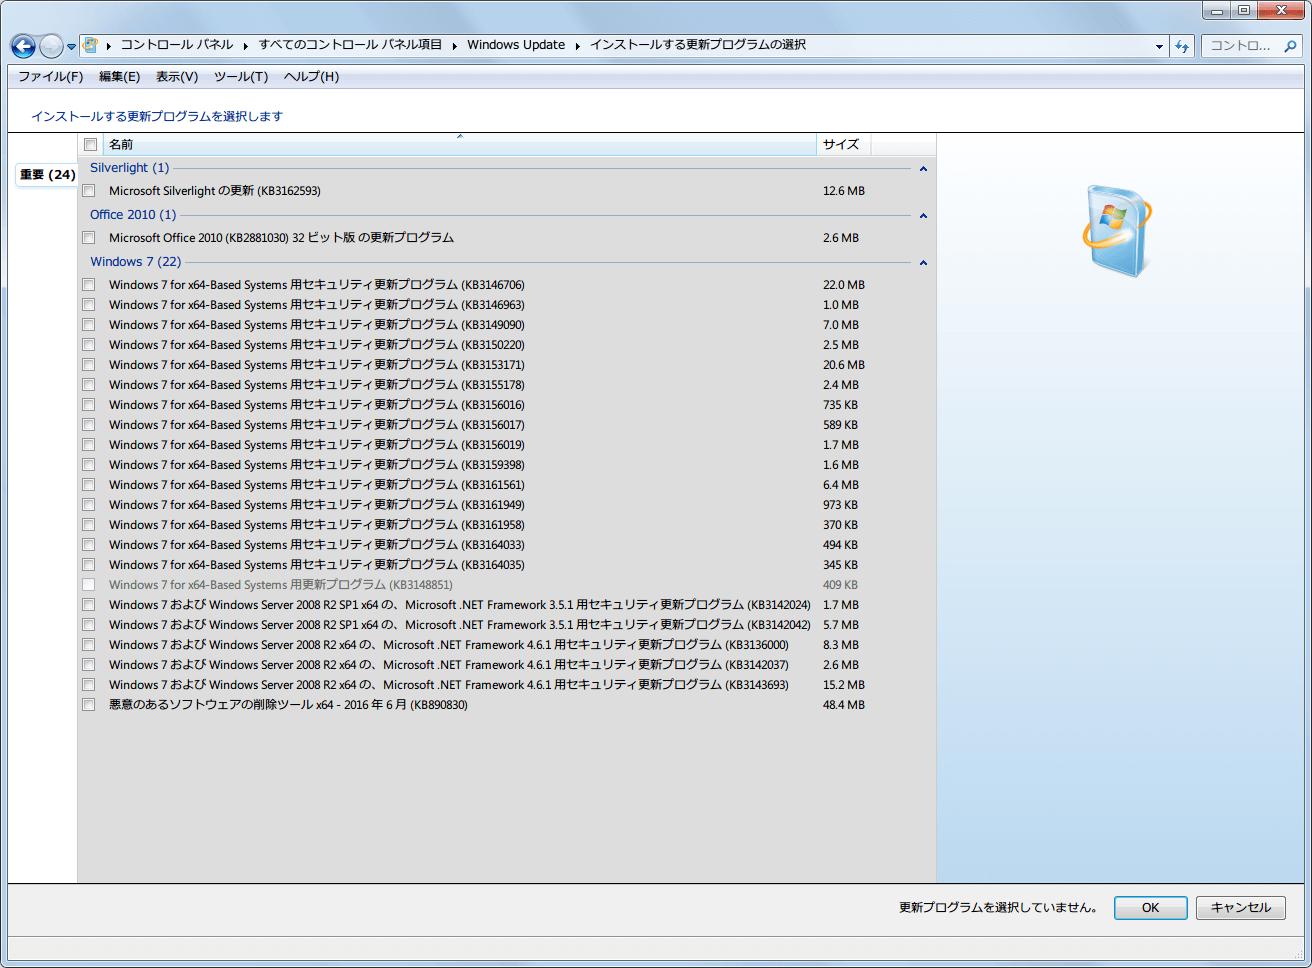 Windows 7 64bit Windows Update 重要 2016年4月~6月分リスト 更新プログラム KB3153731 非表示後に表示された KB3148851 を非表示